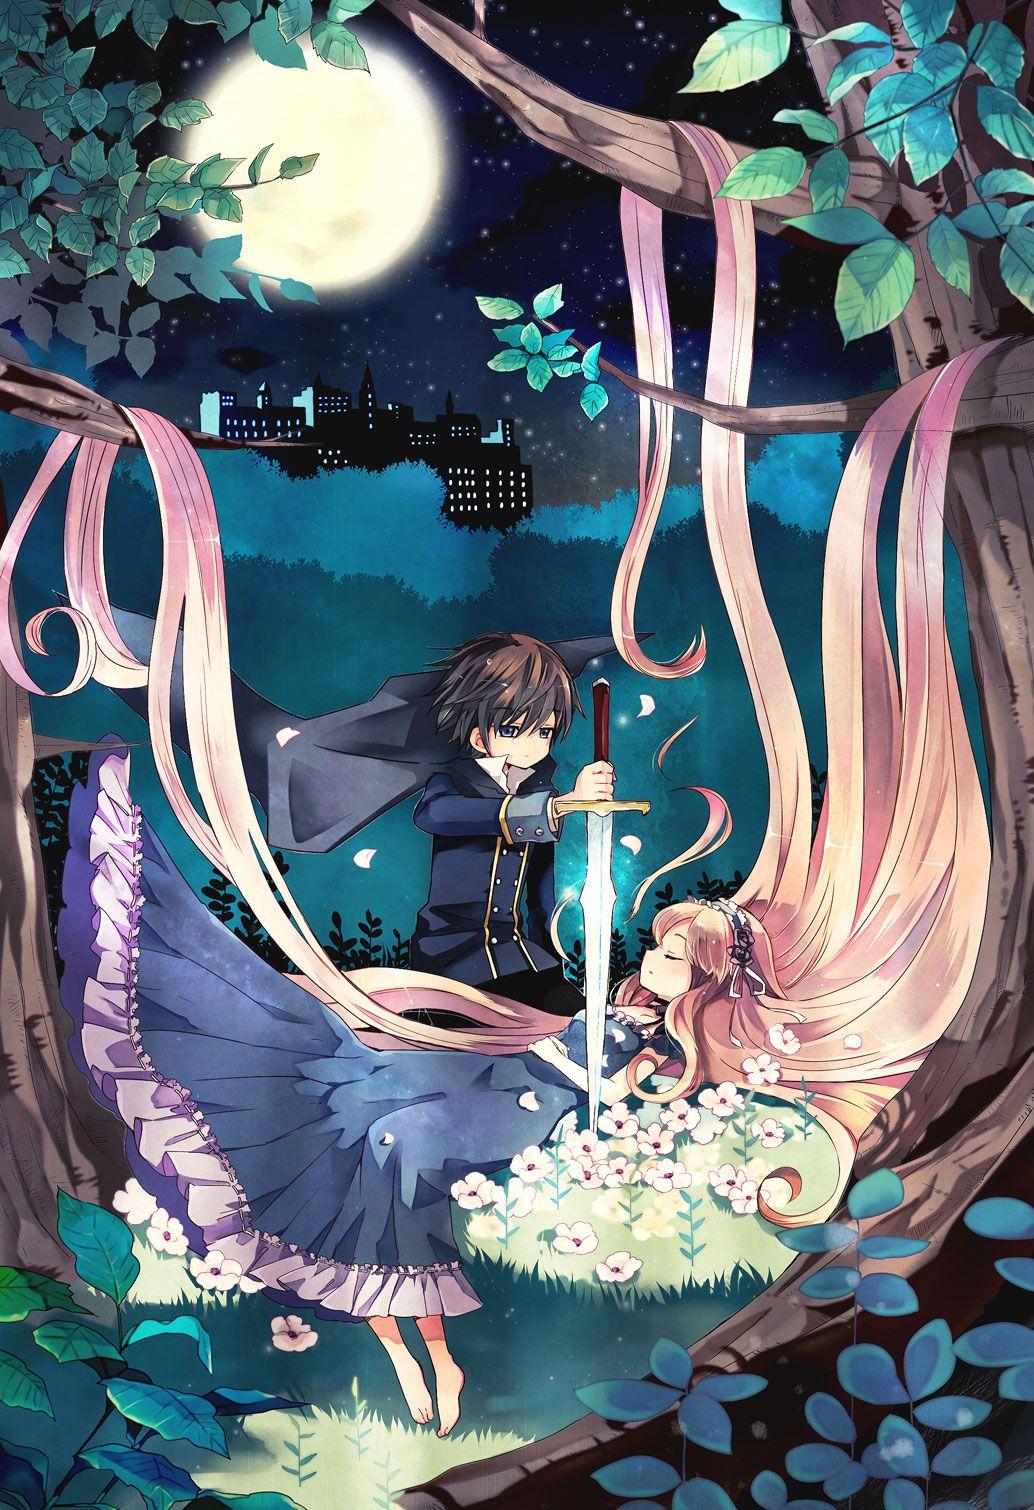 /Sleeping Beauty/#300196 - Zerochan he looks like he is ...